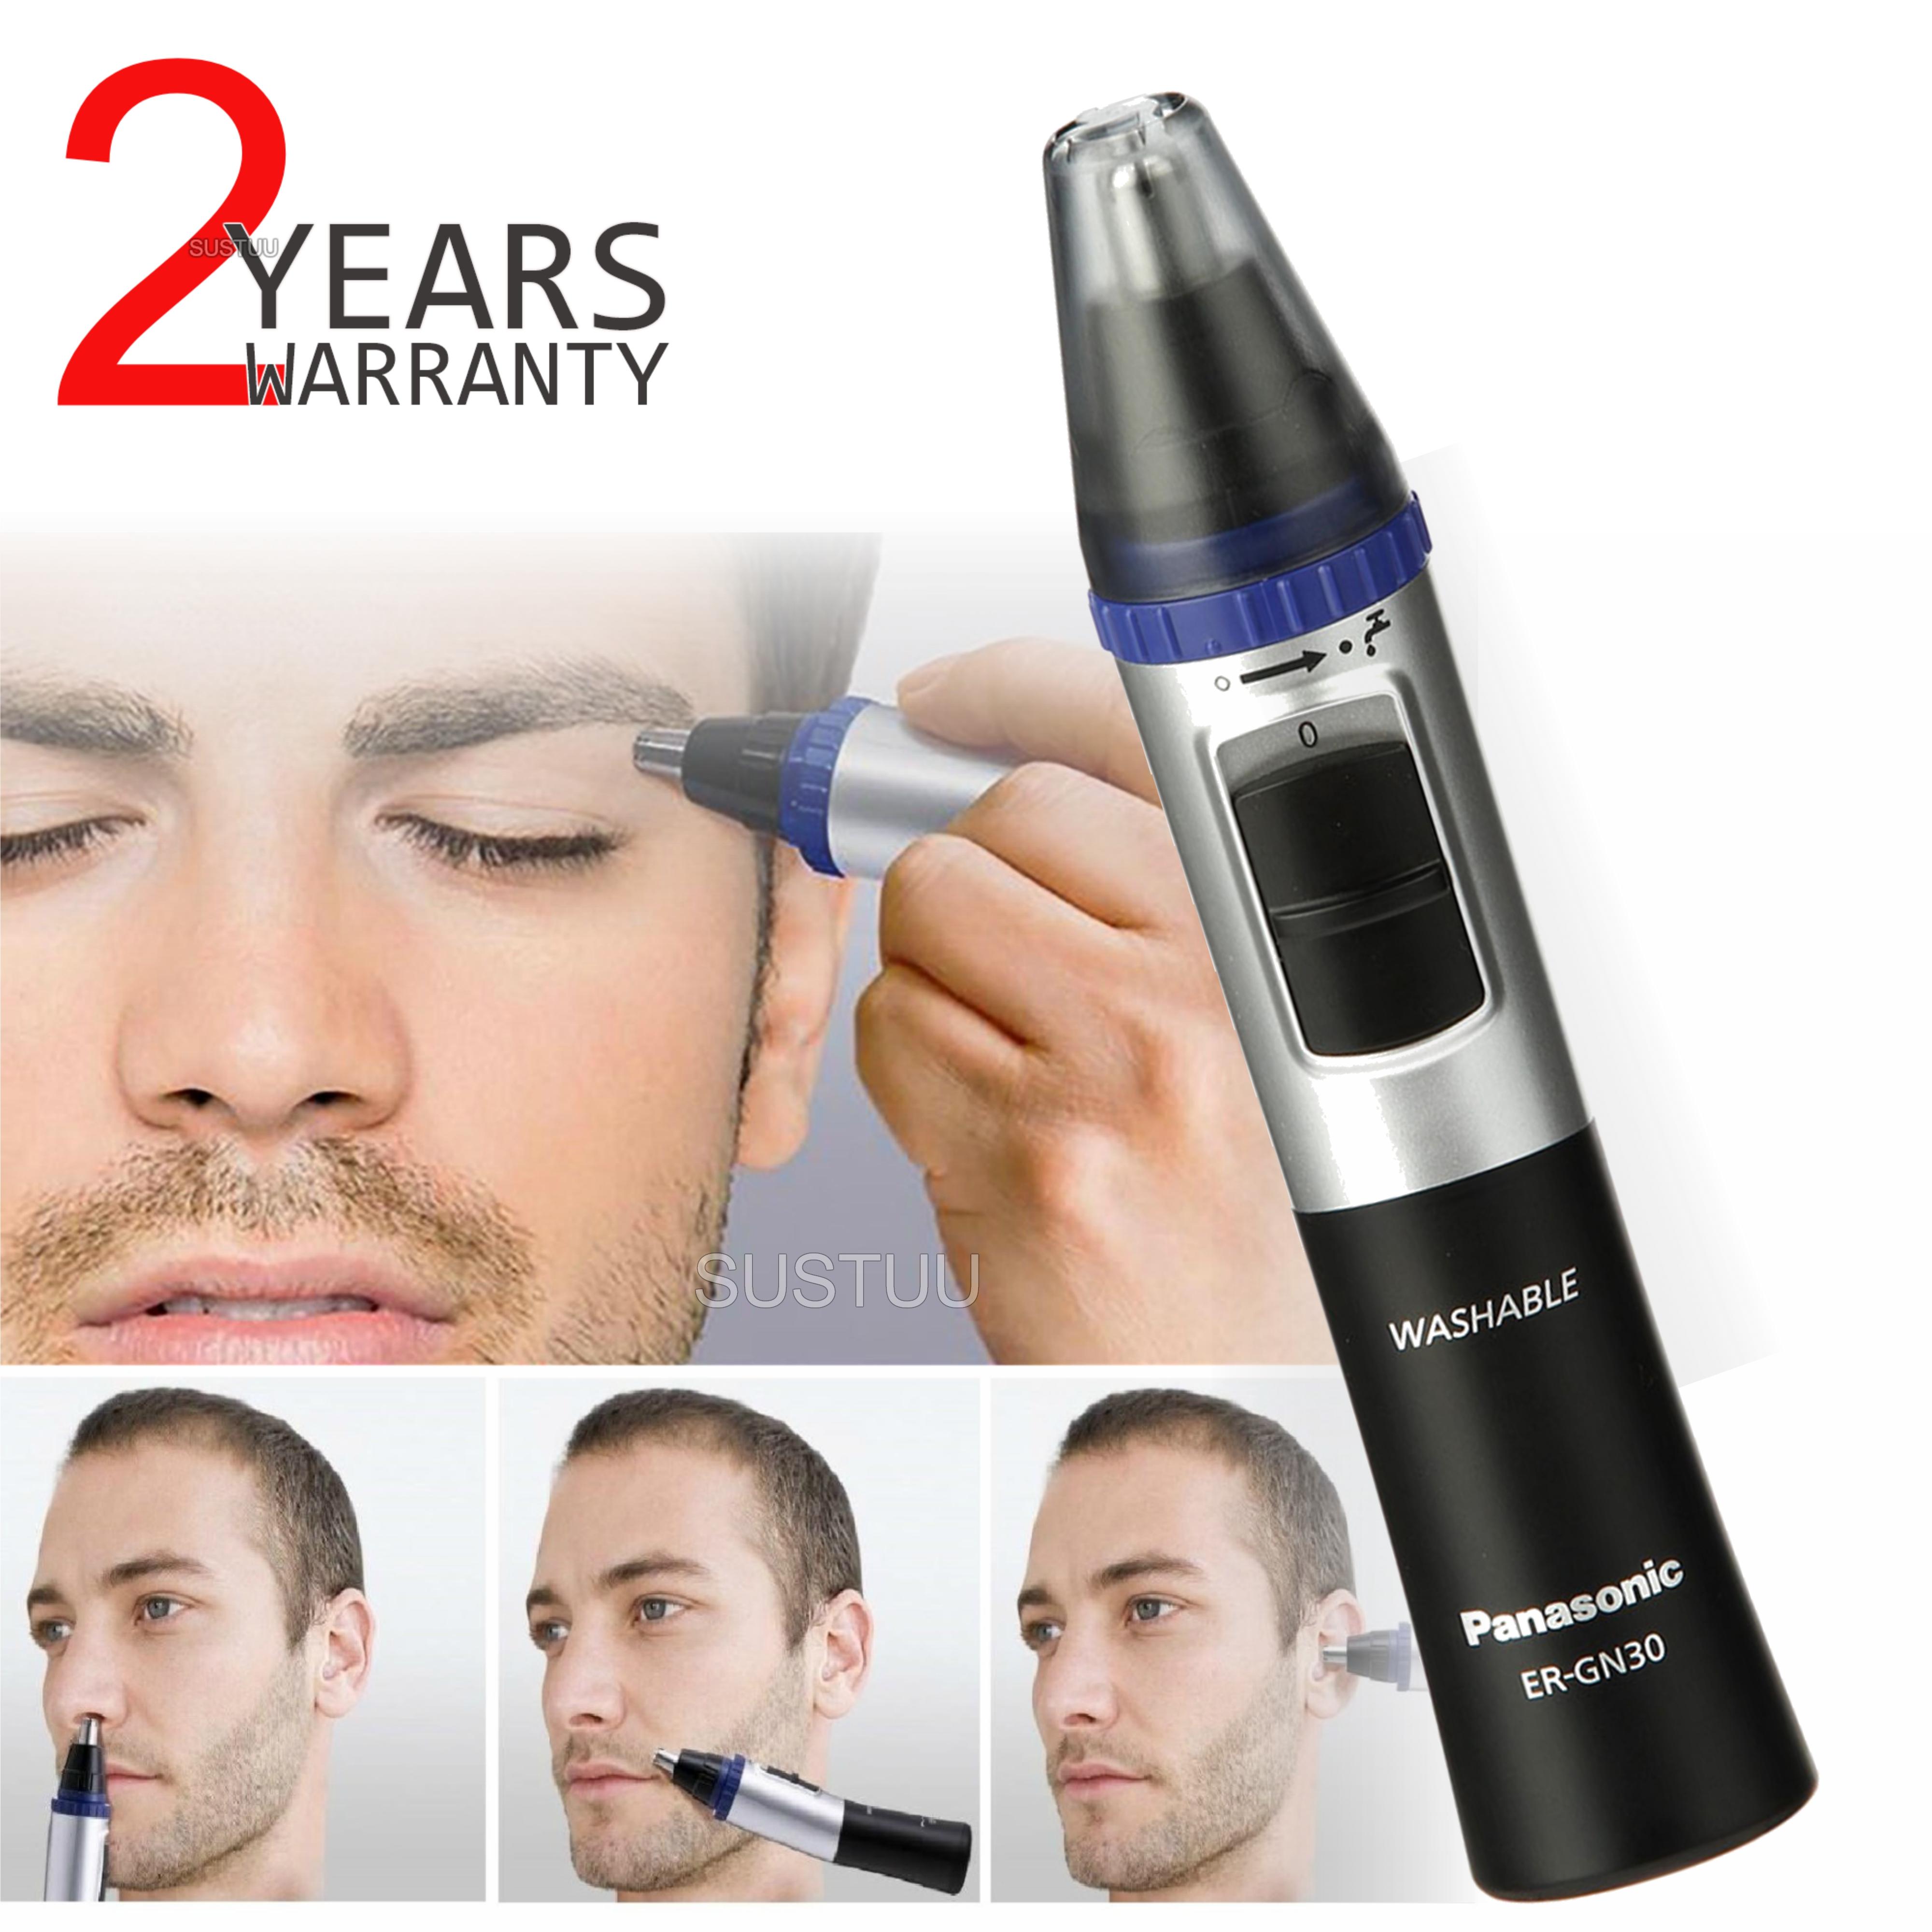 Panasonic Wet & Dry Battery Trimmer | Nose-Ear-Eyebrow-Face Hair Clipper | ERGN30